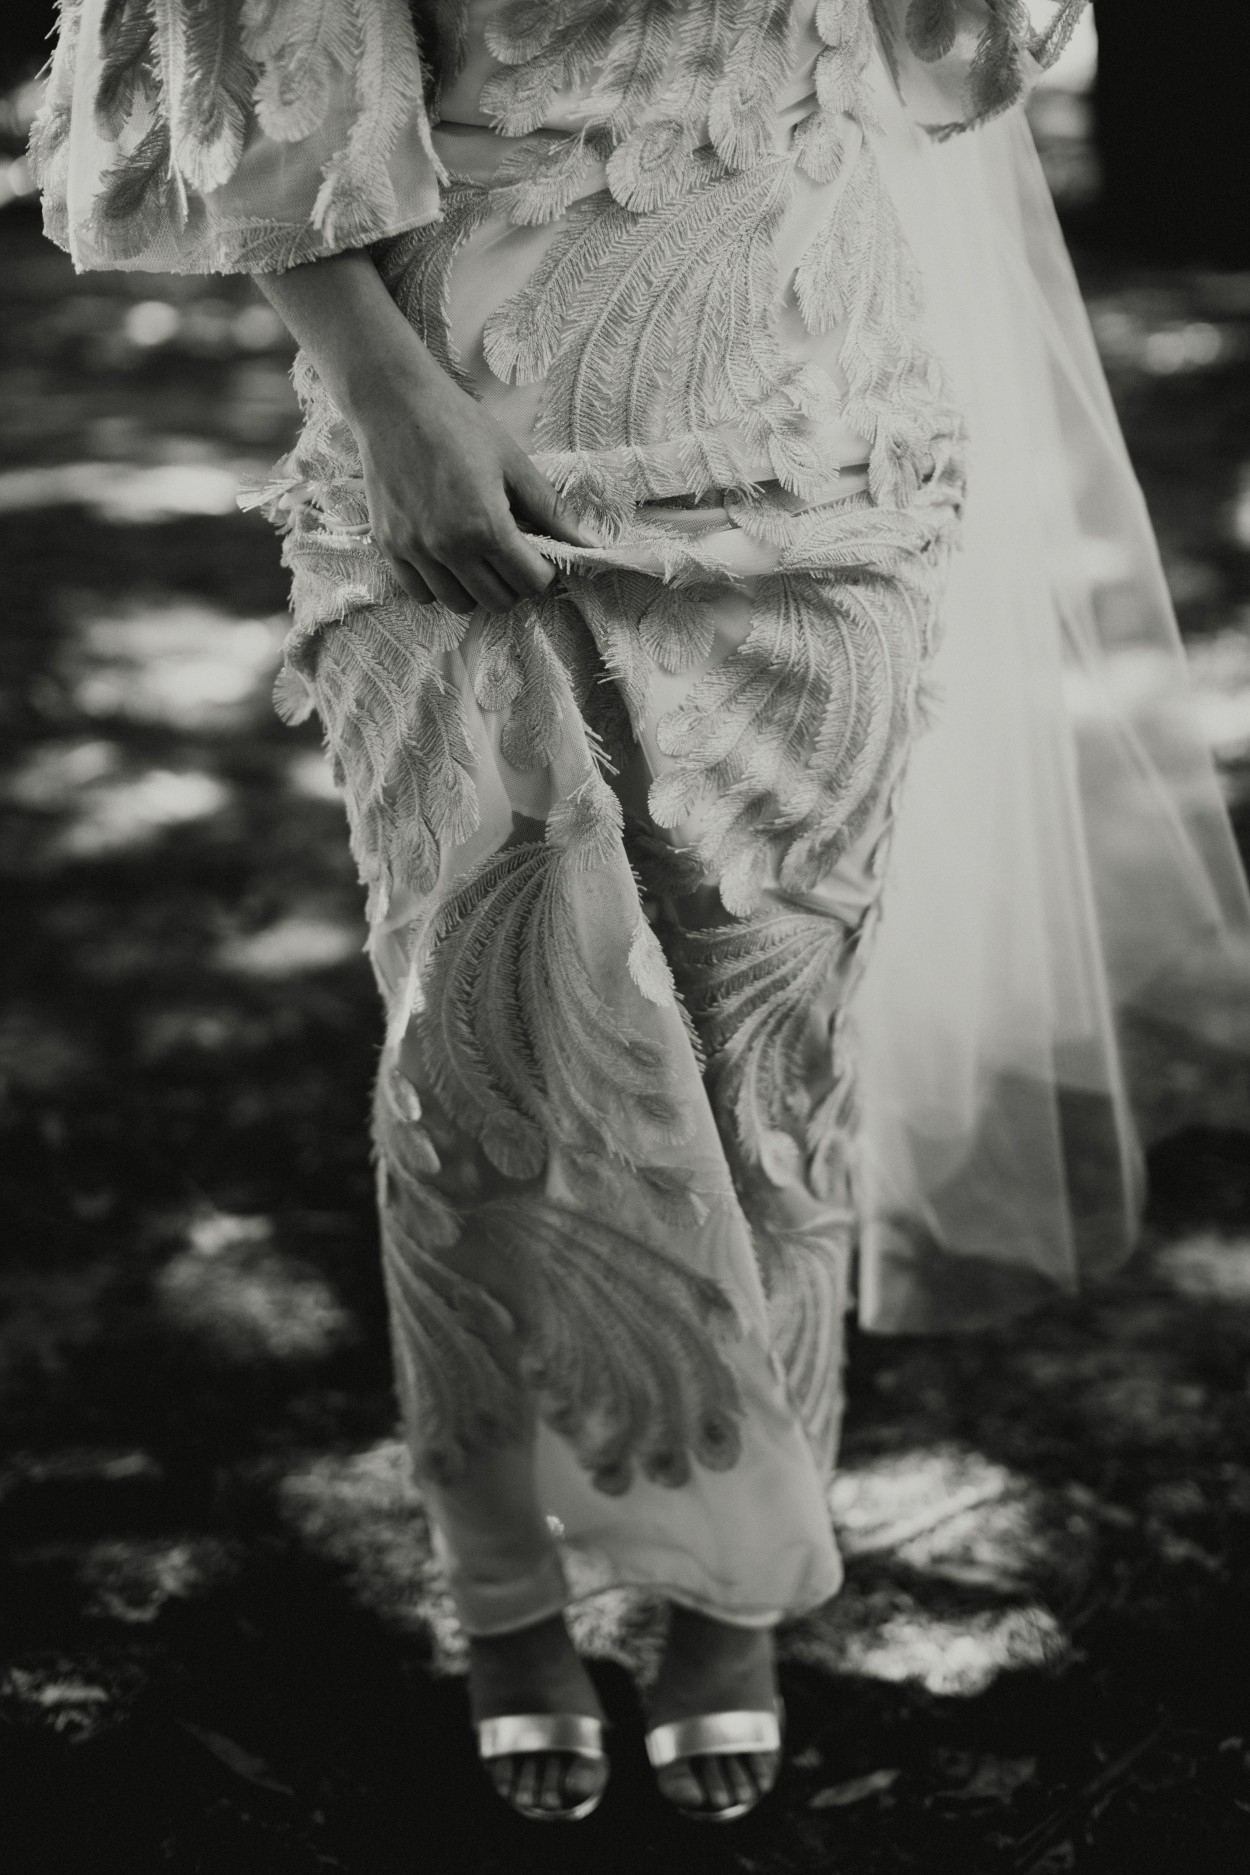 I-Got-You-Babe-Weddings-Heide-Museum-of-Modern-Art-Elopement-Susie-Nathan040.jpg